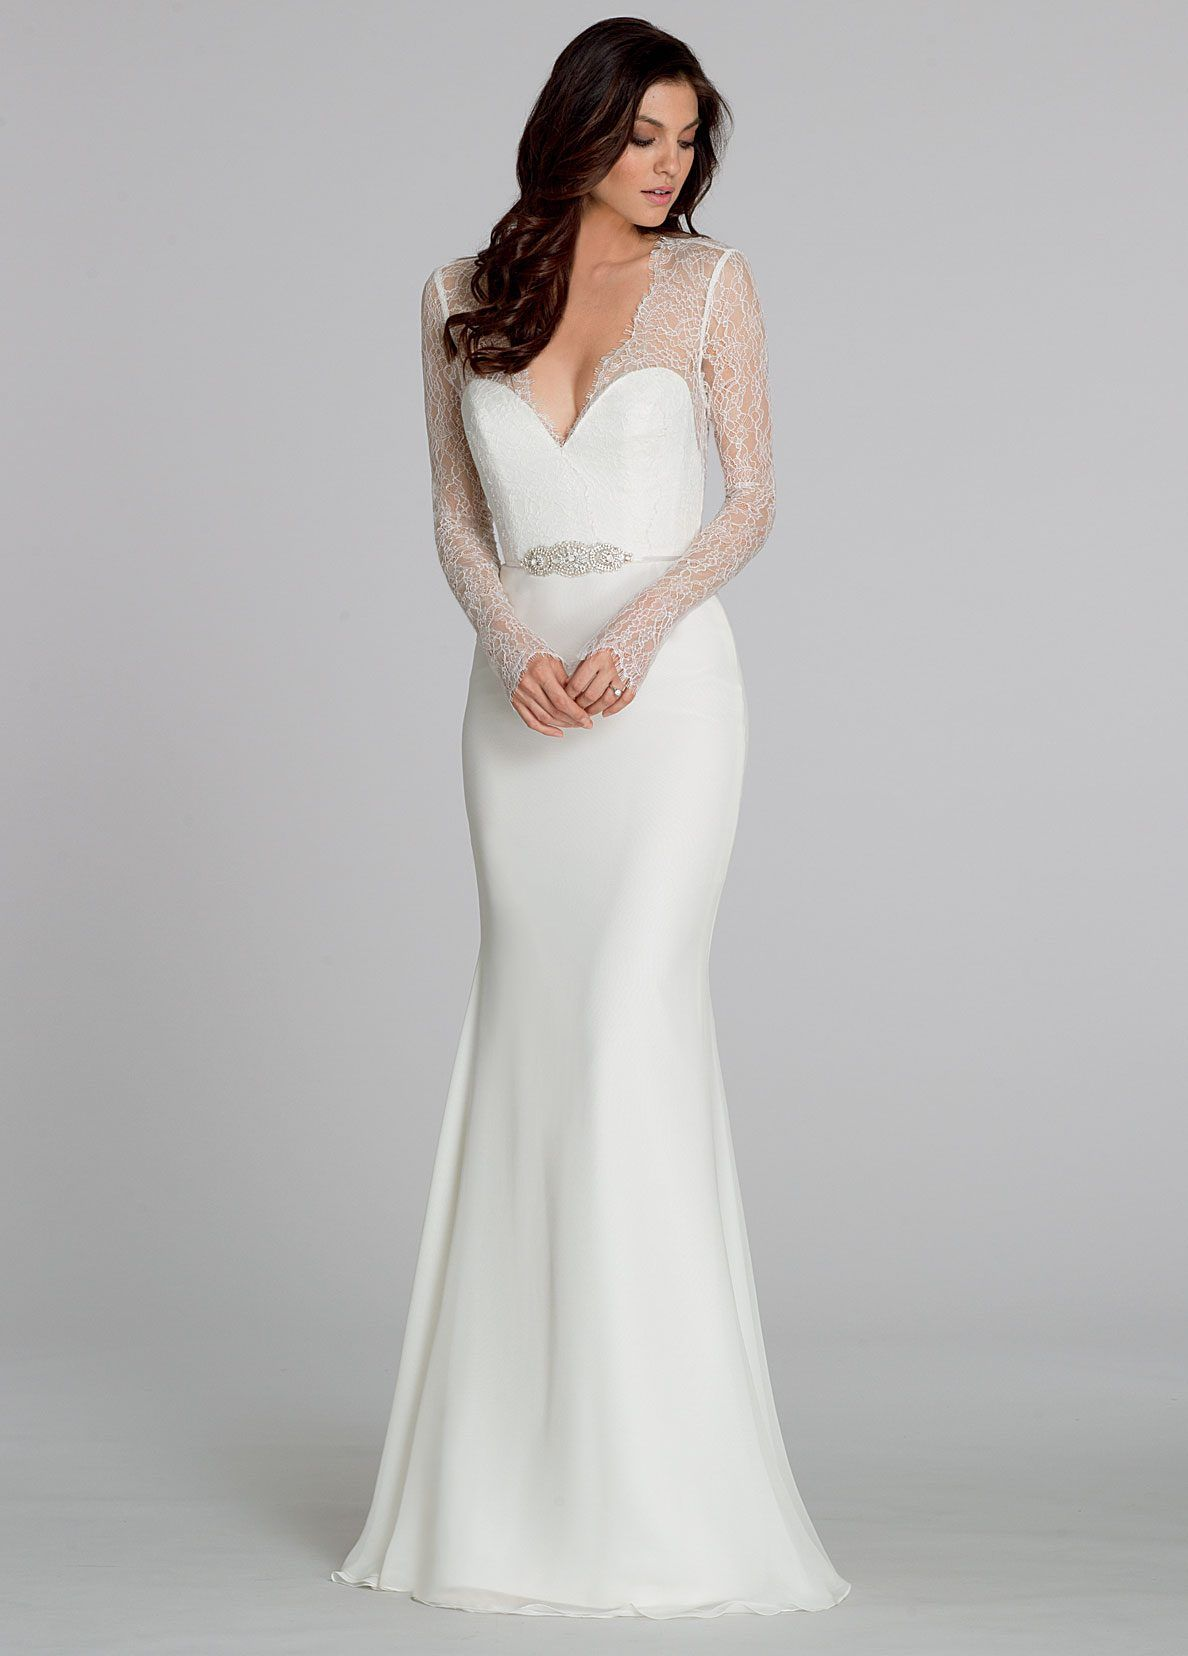 Ivory chiffon sheath bridal gown long sleeve chantilly lace bodice